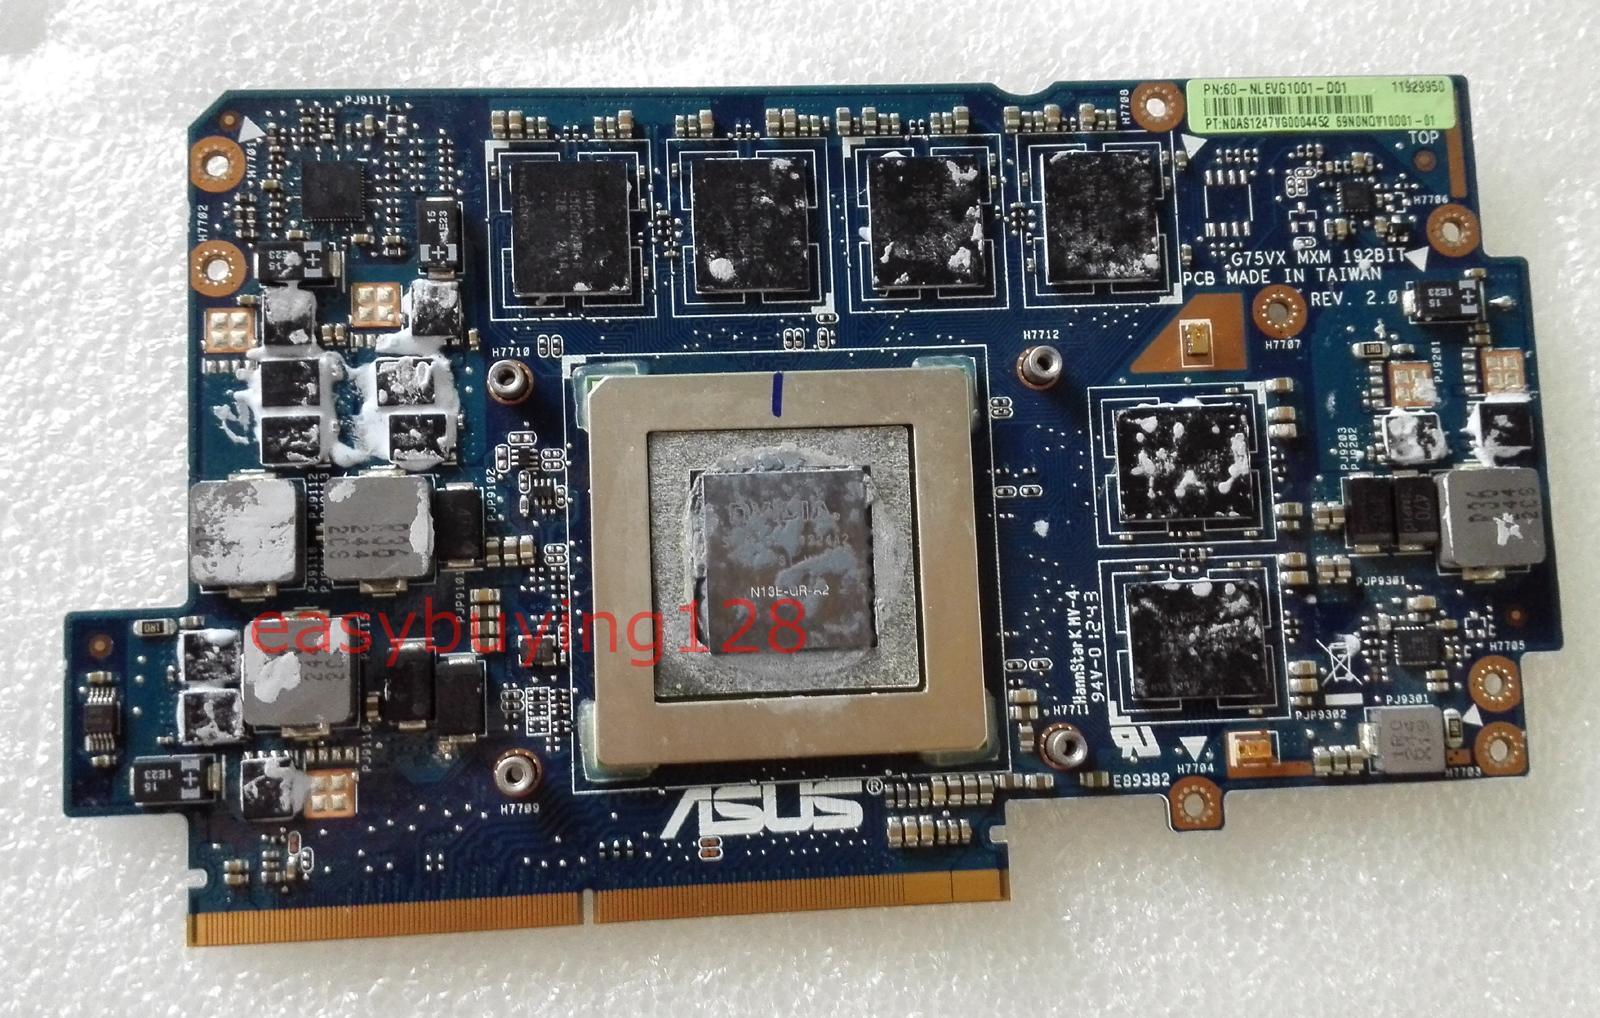 Fit Asus G75VX Laptop GTX 670M DDR5 VGA V3G Video card Graphic Card USA